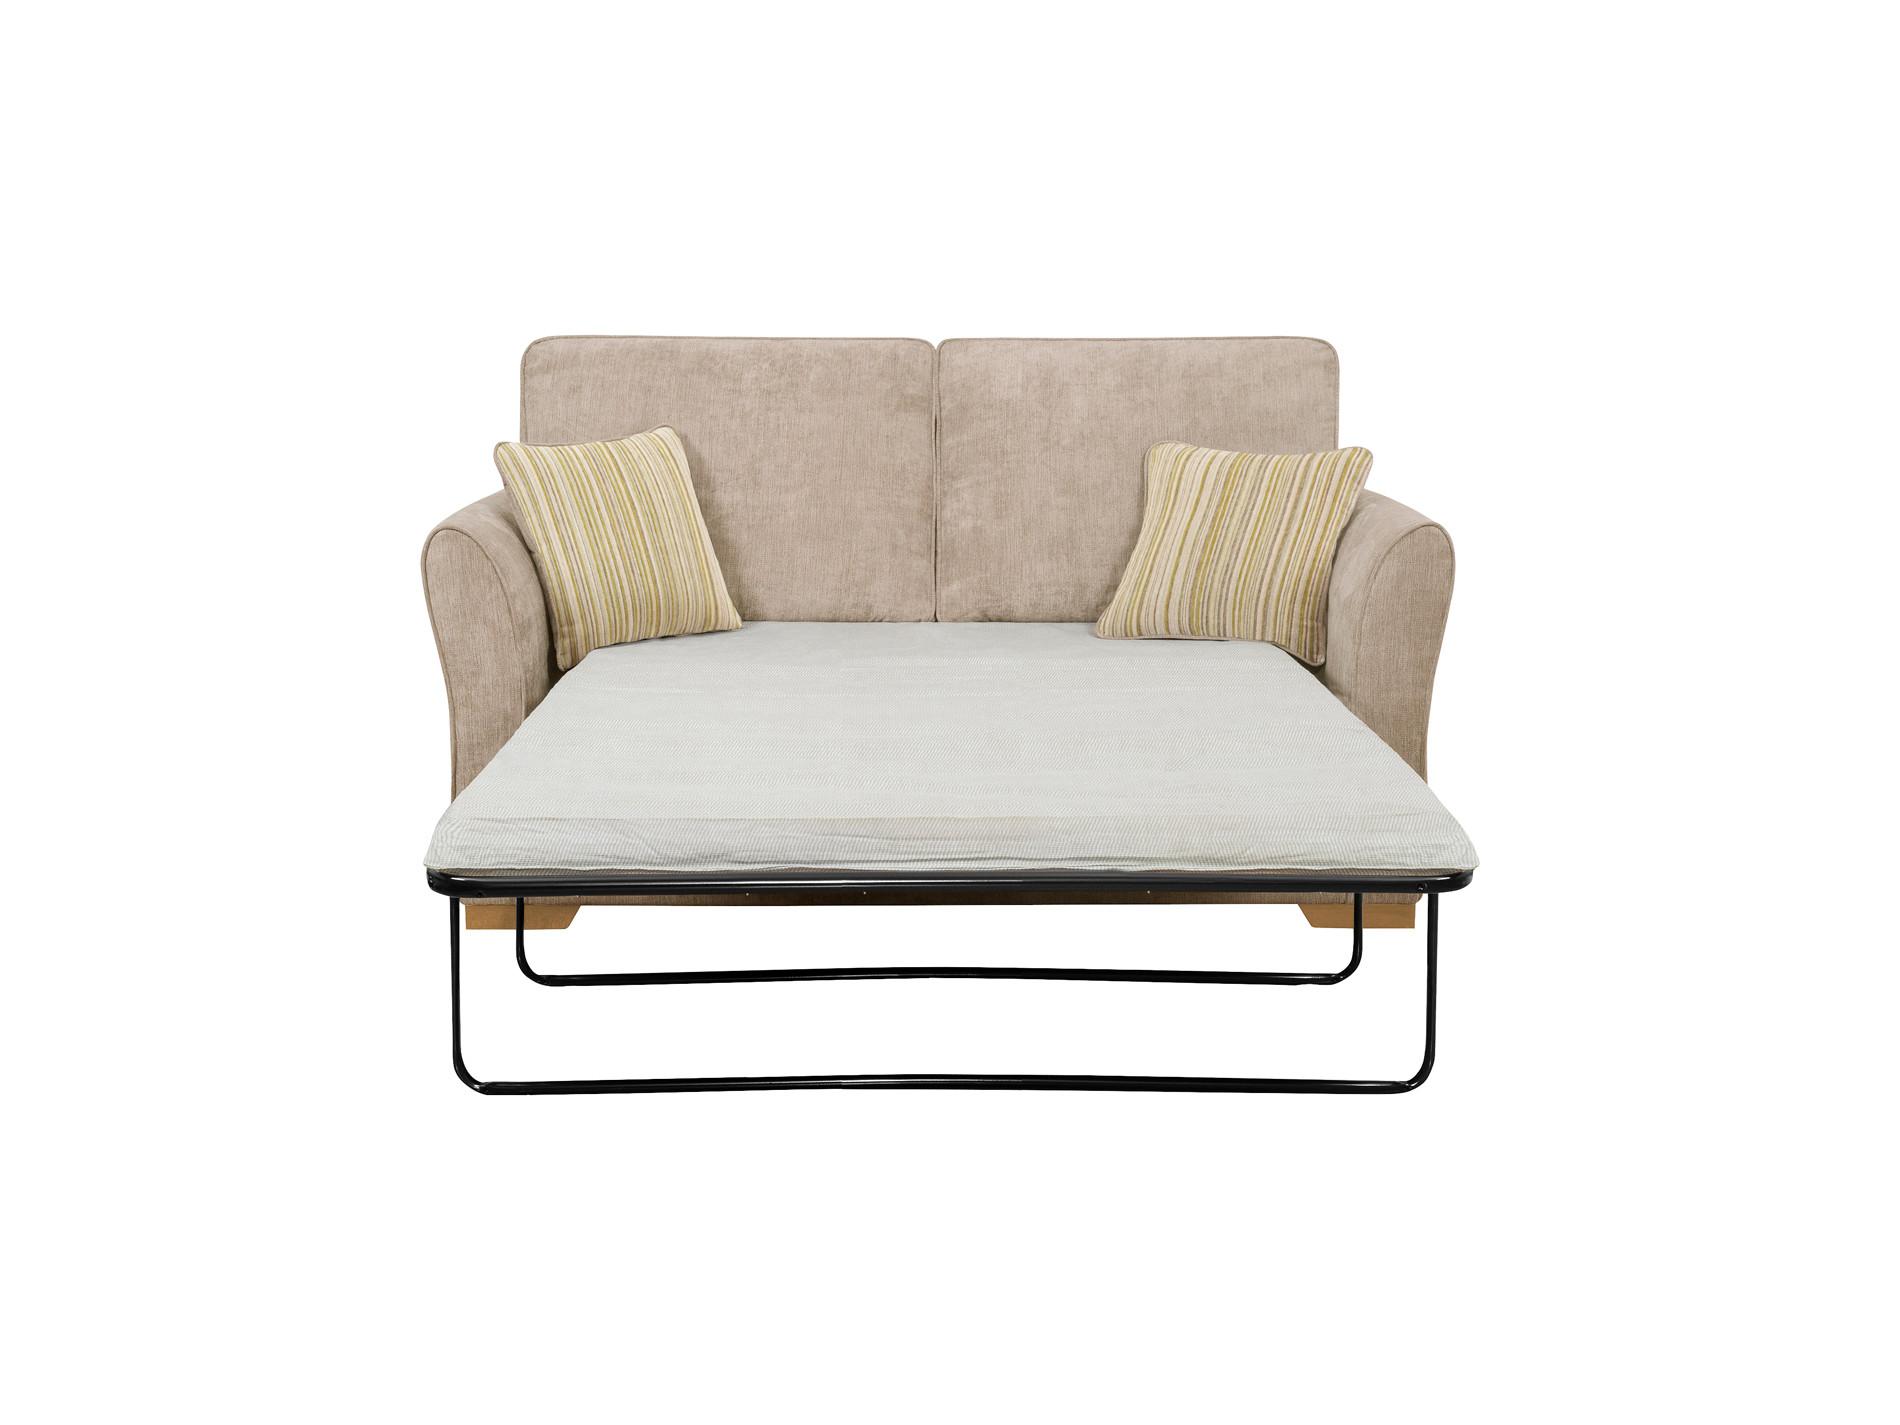 Jasmine 2 Seater Sofa Bed With Standard Mattress In Linen